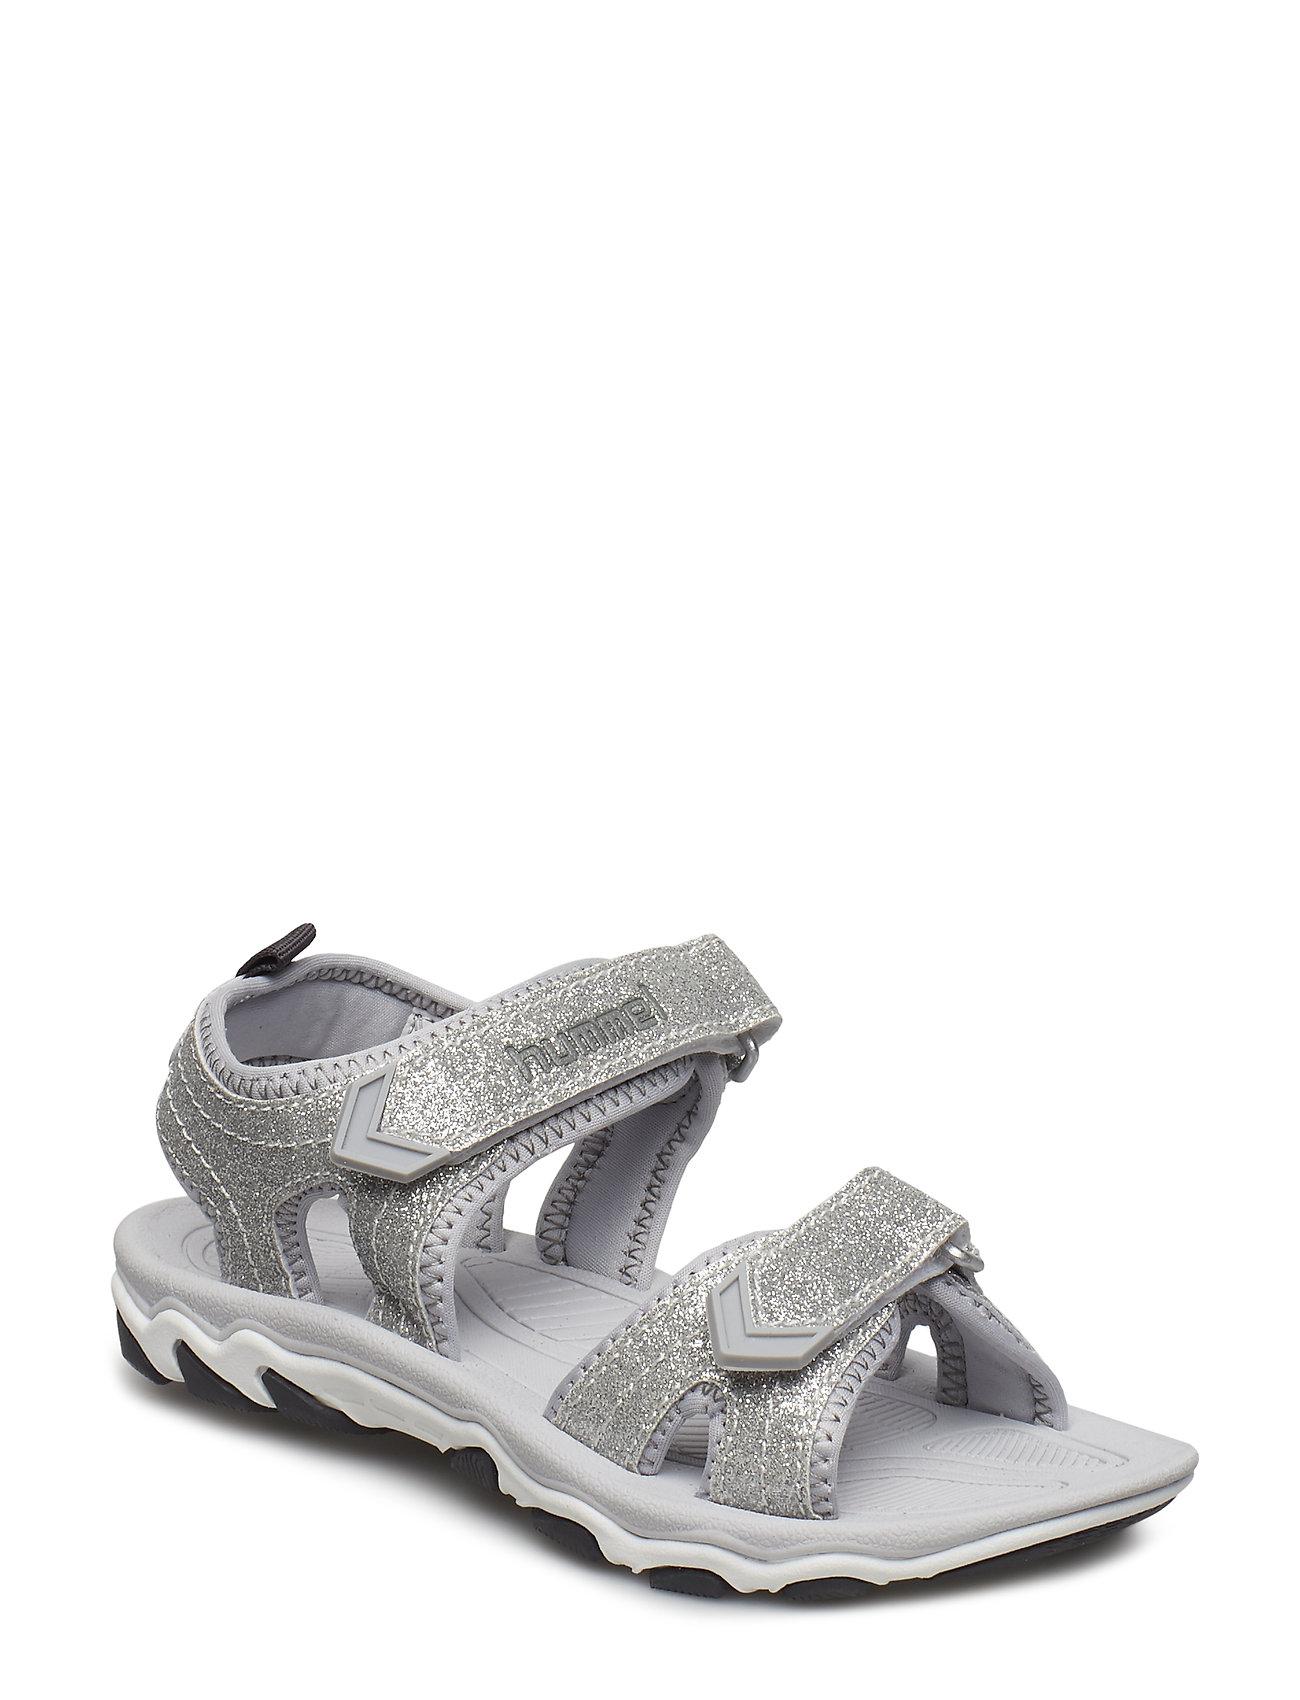 77a927fdcd0 Hummel Sandal Glitter Jr (Silver), (29.96 €) | Large selection of ...